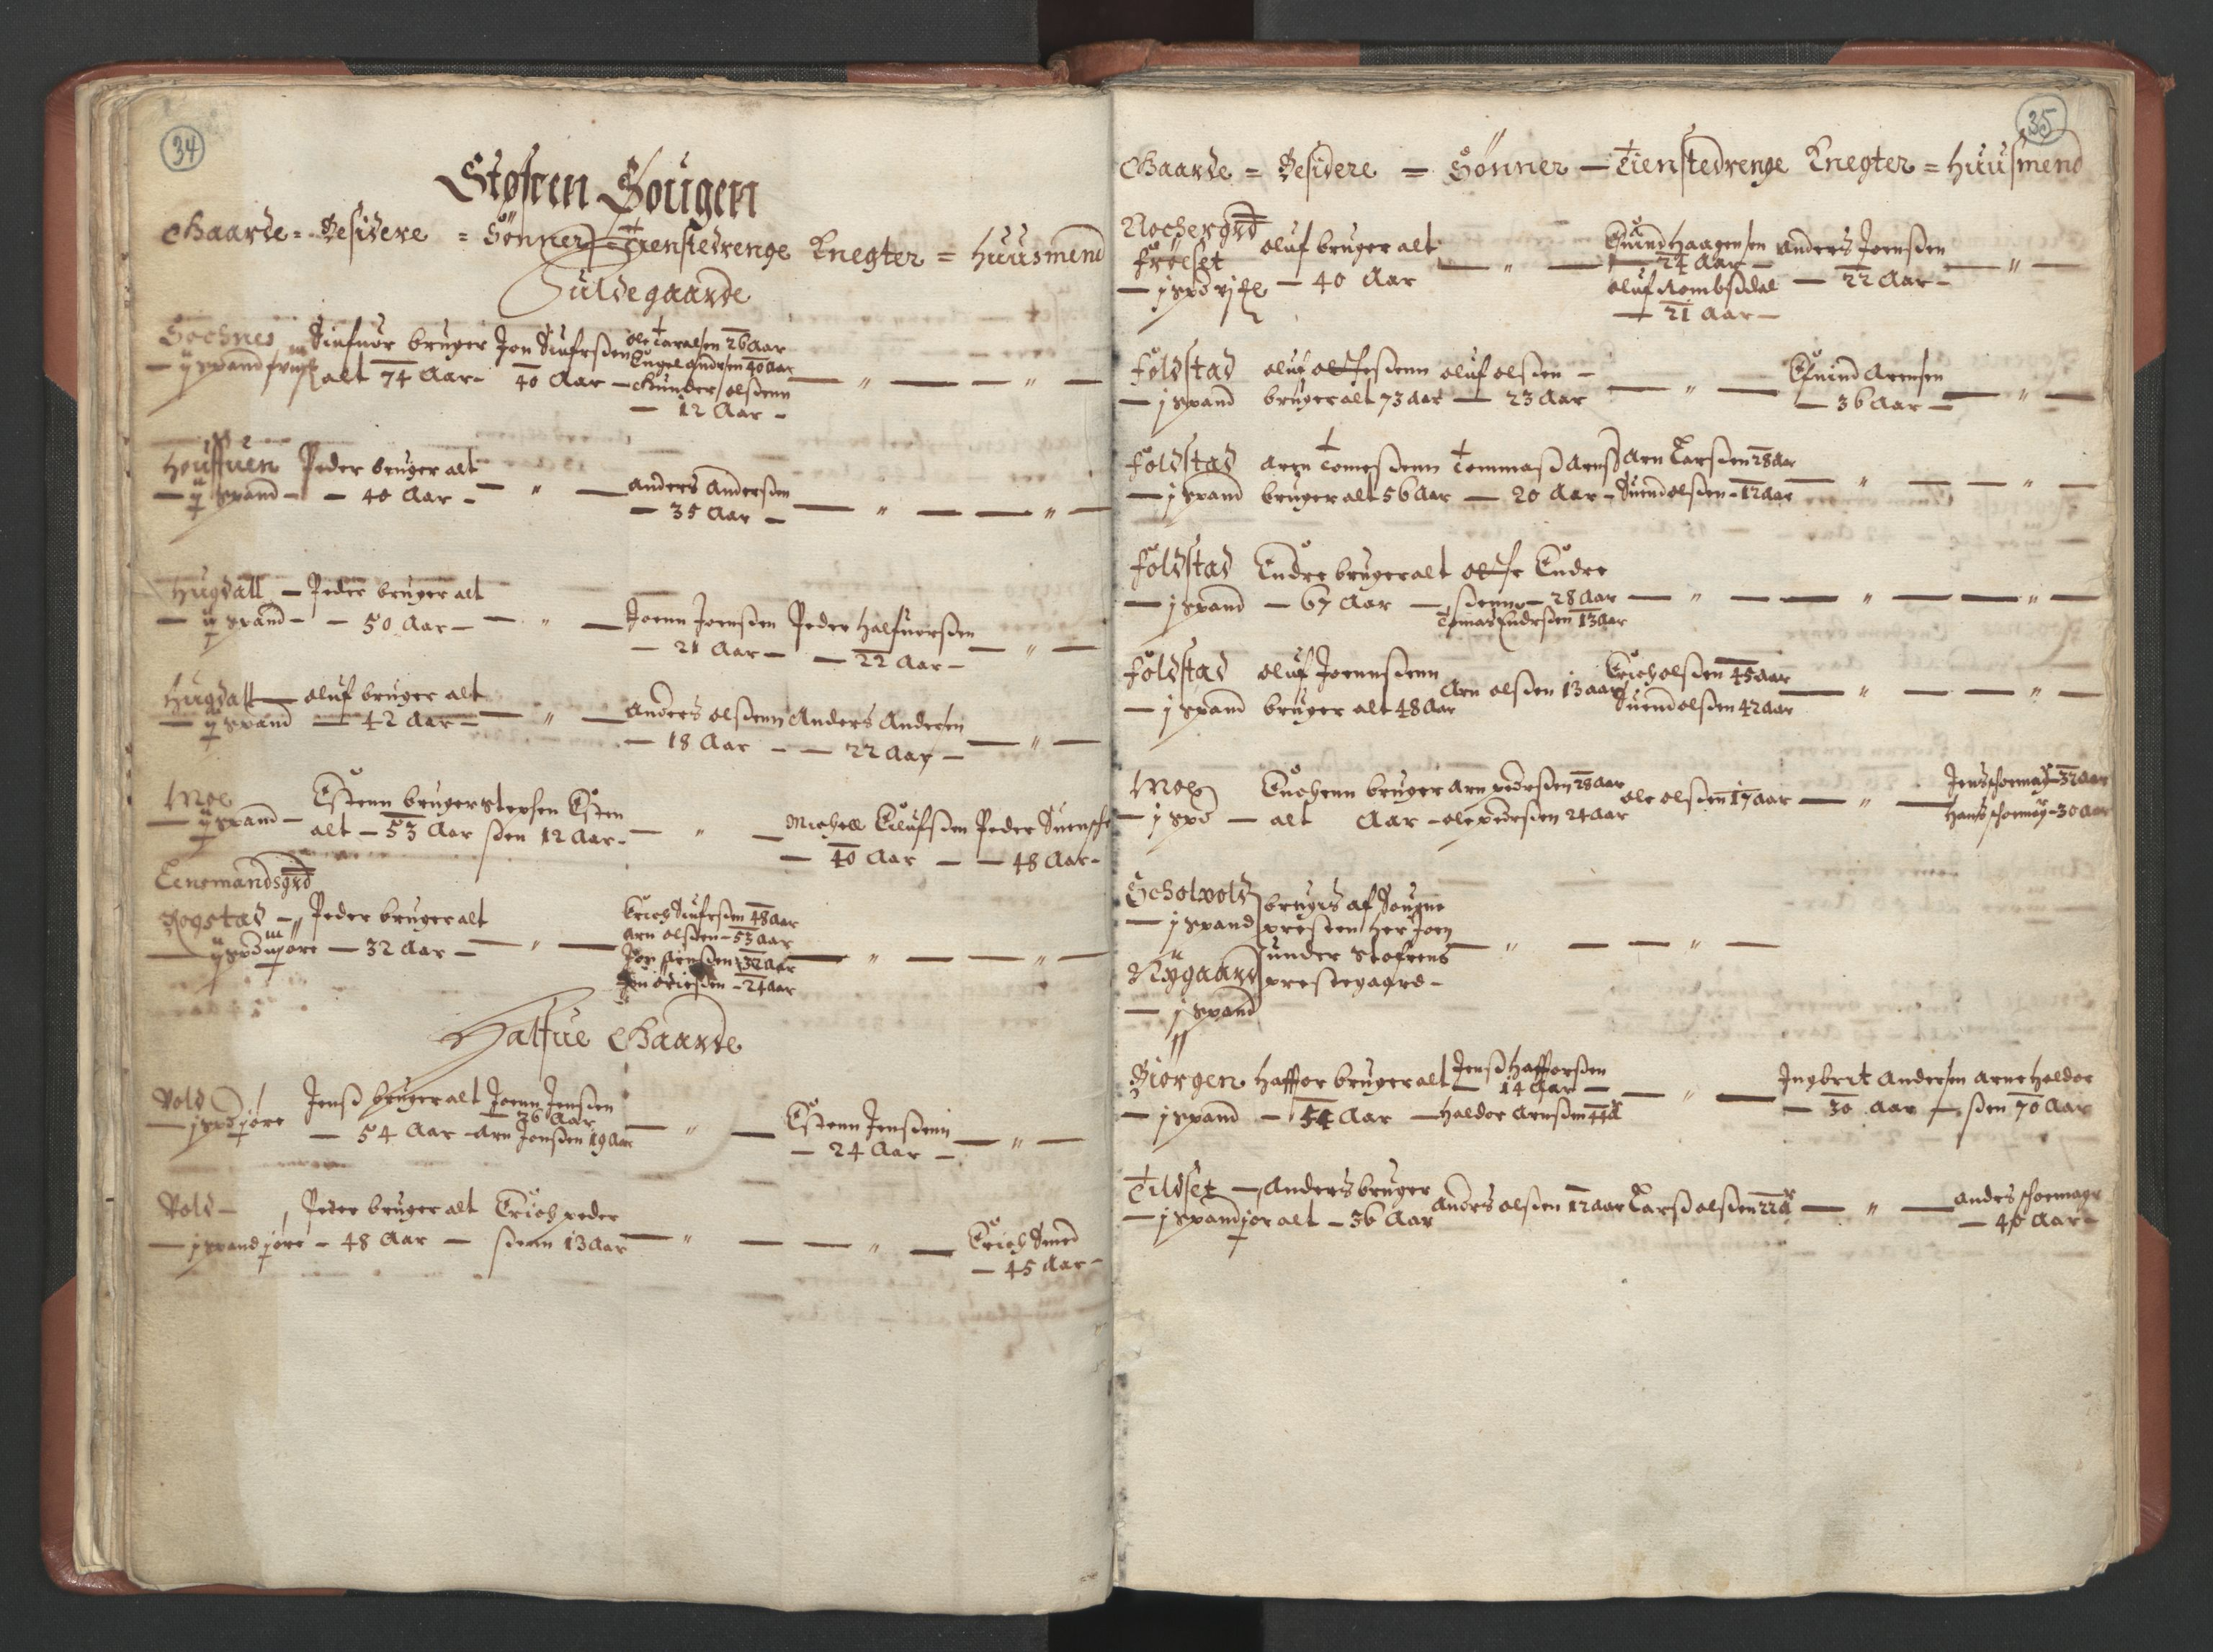 RA, Fogdenes og sorenskrivernes manntall 1664-1666, nr. 18: Gauldal fogderi, Strinda fogderi og Orkdal fogderi, 1664, s. 34-35